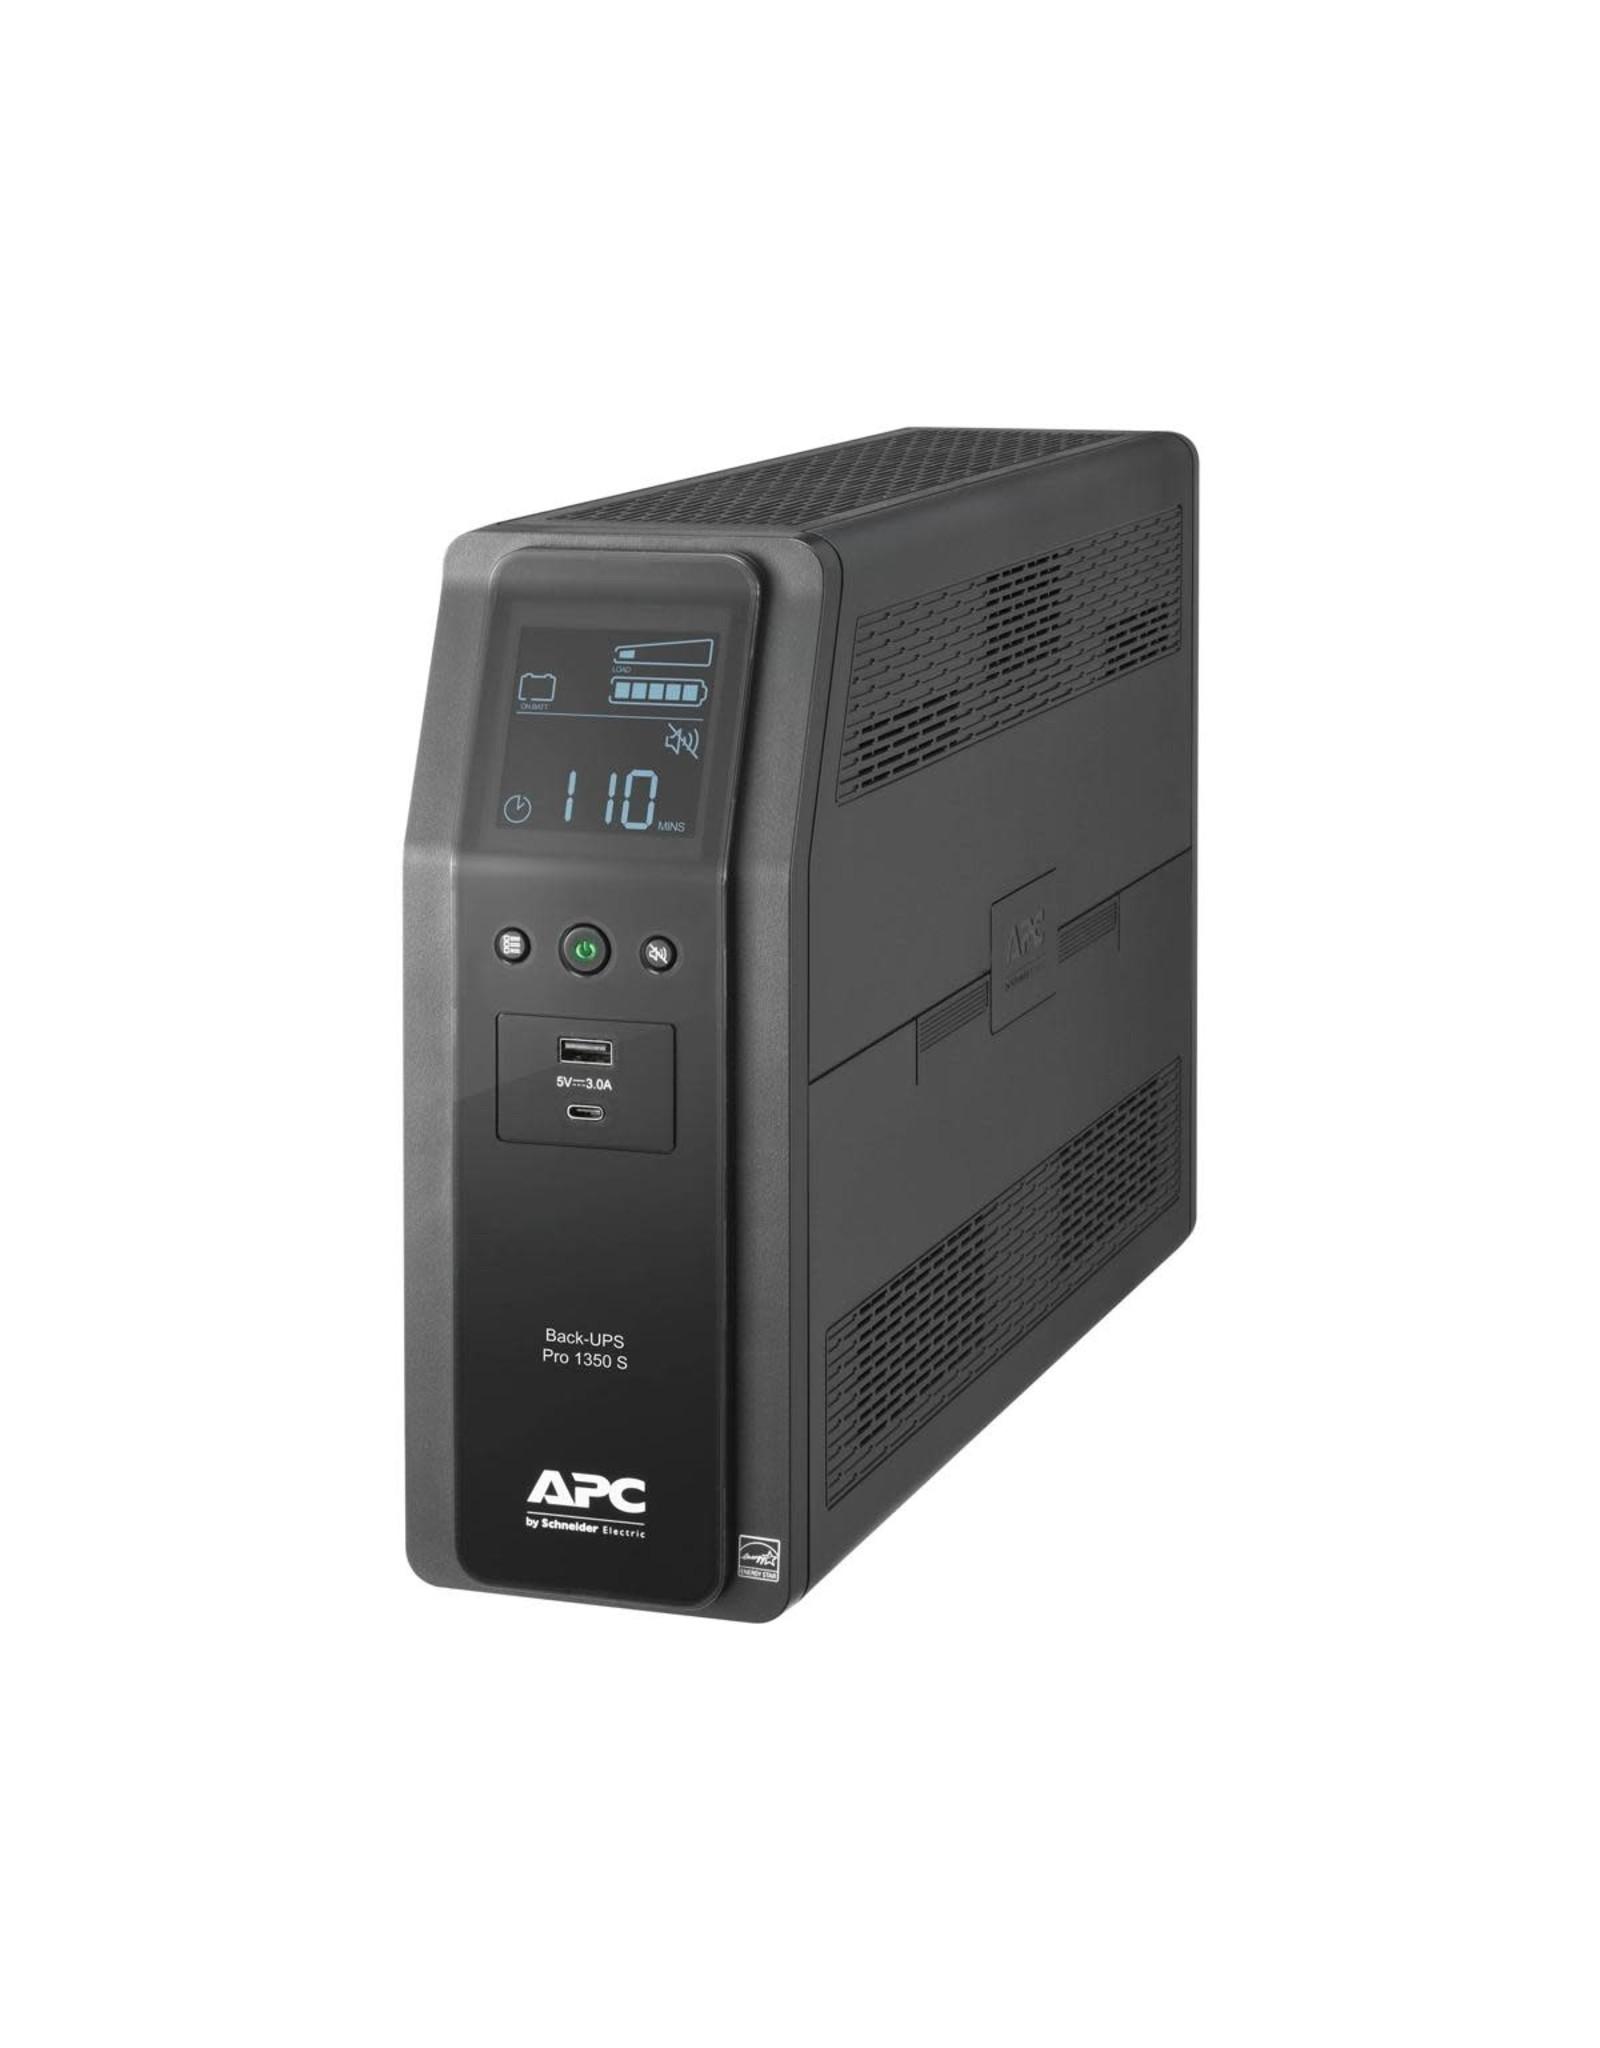 APC APC Back-UPS PRO BR 1350VA, SineWave, 10 Outlets, 2 USB Charging Ports, AVR, LCD interface